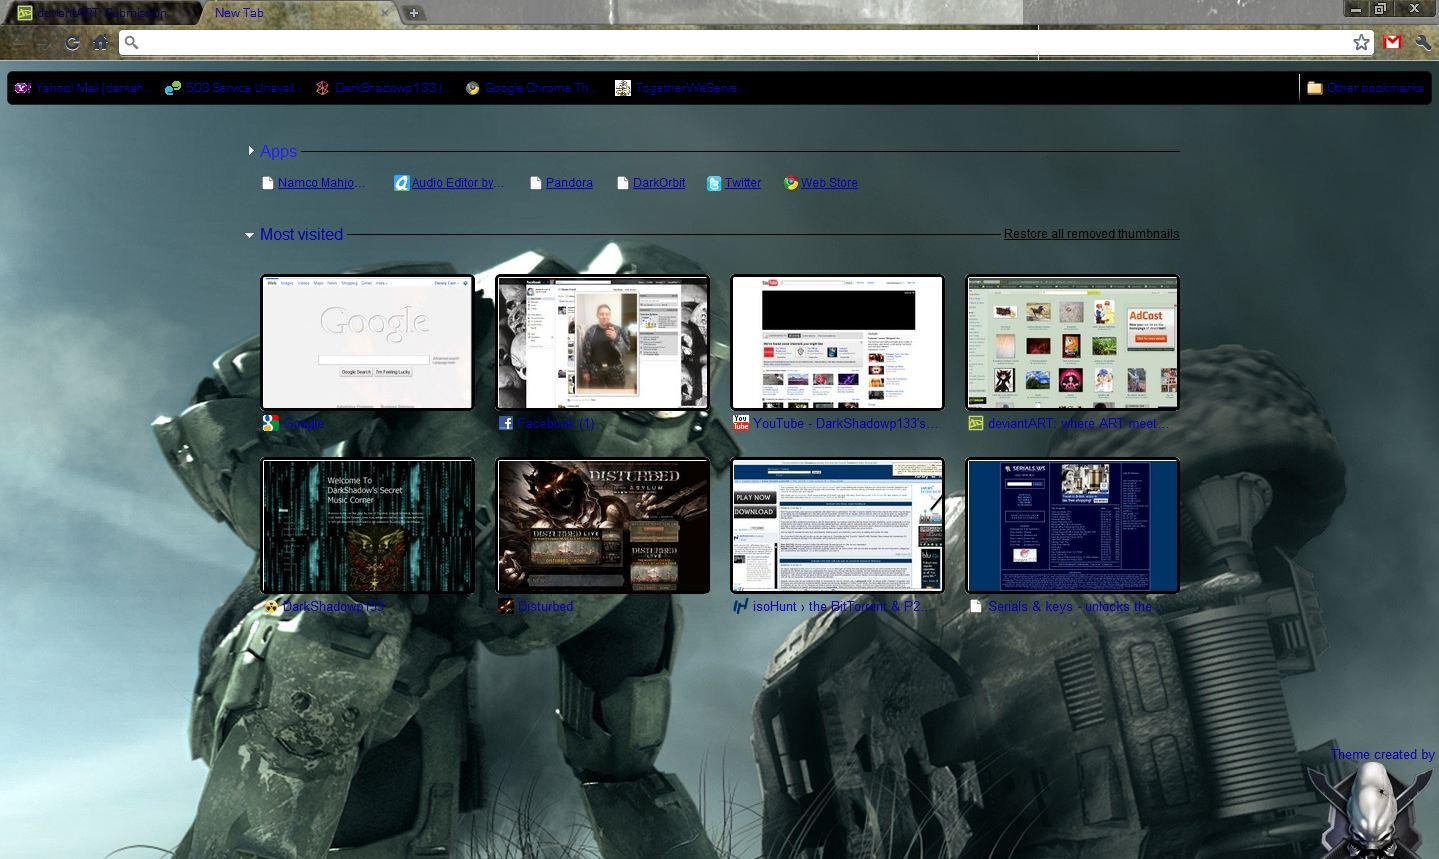 Google themes editor - Halo Google Chrome Theme By Darkshadowp133 Halo Google Chrome Theme By Darkshadowp133